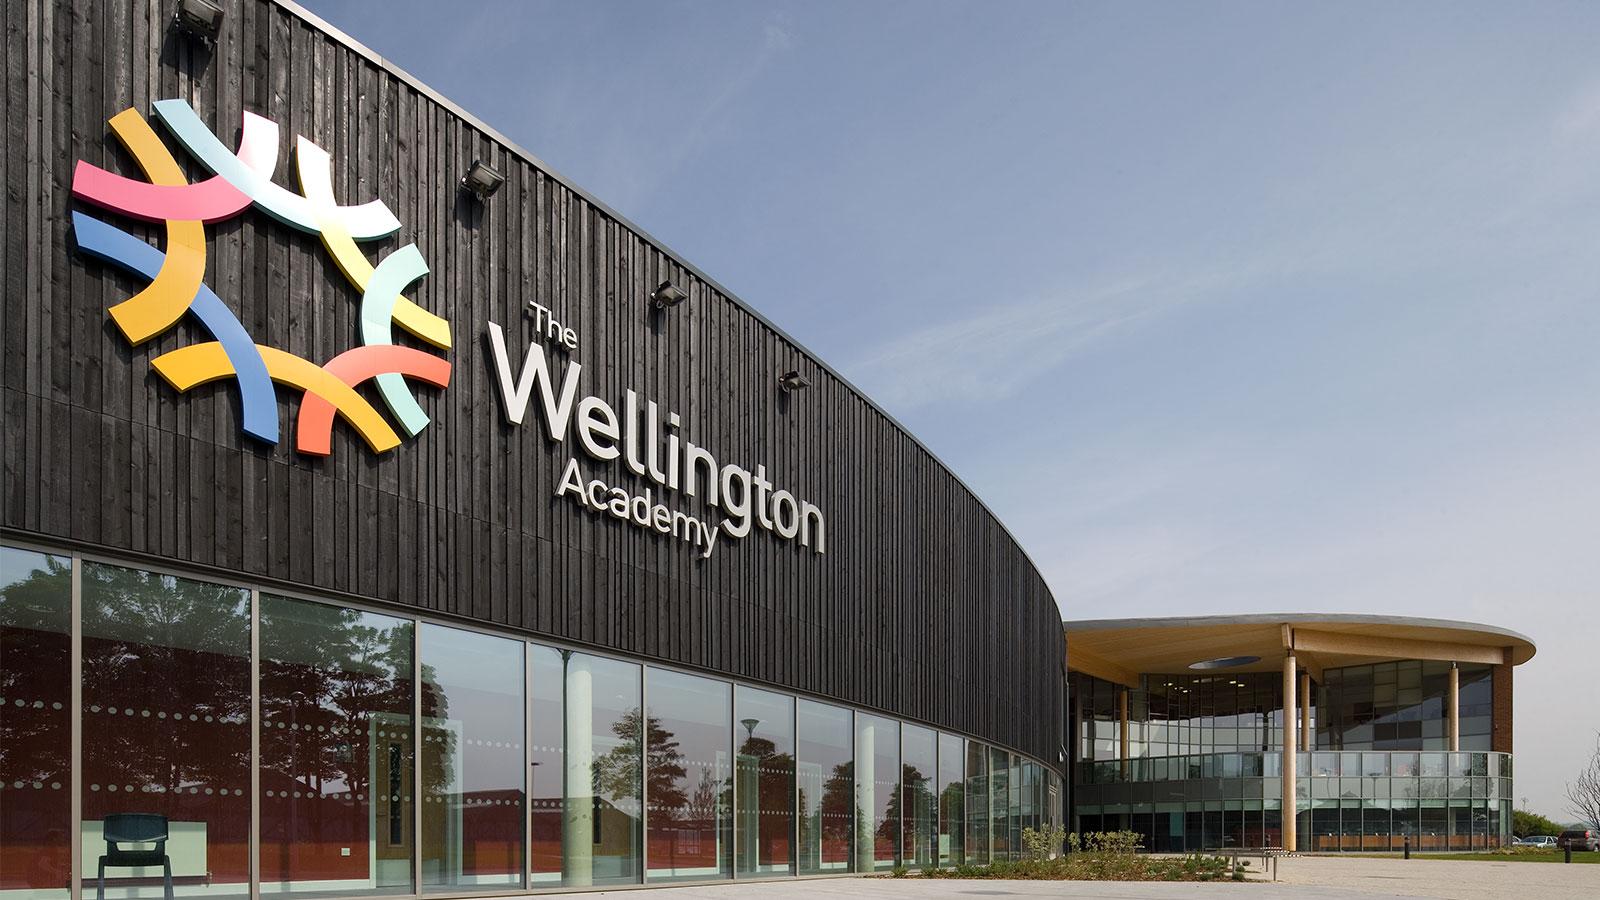 02_wellington-academy_ext3.jpg